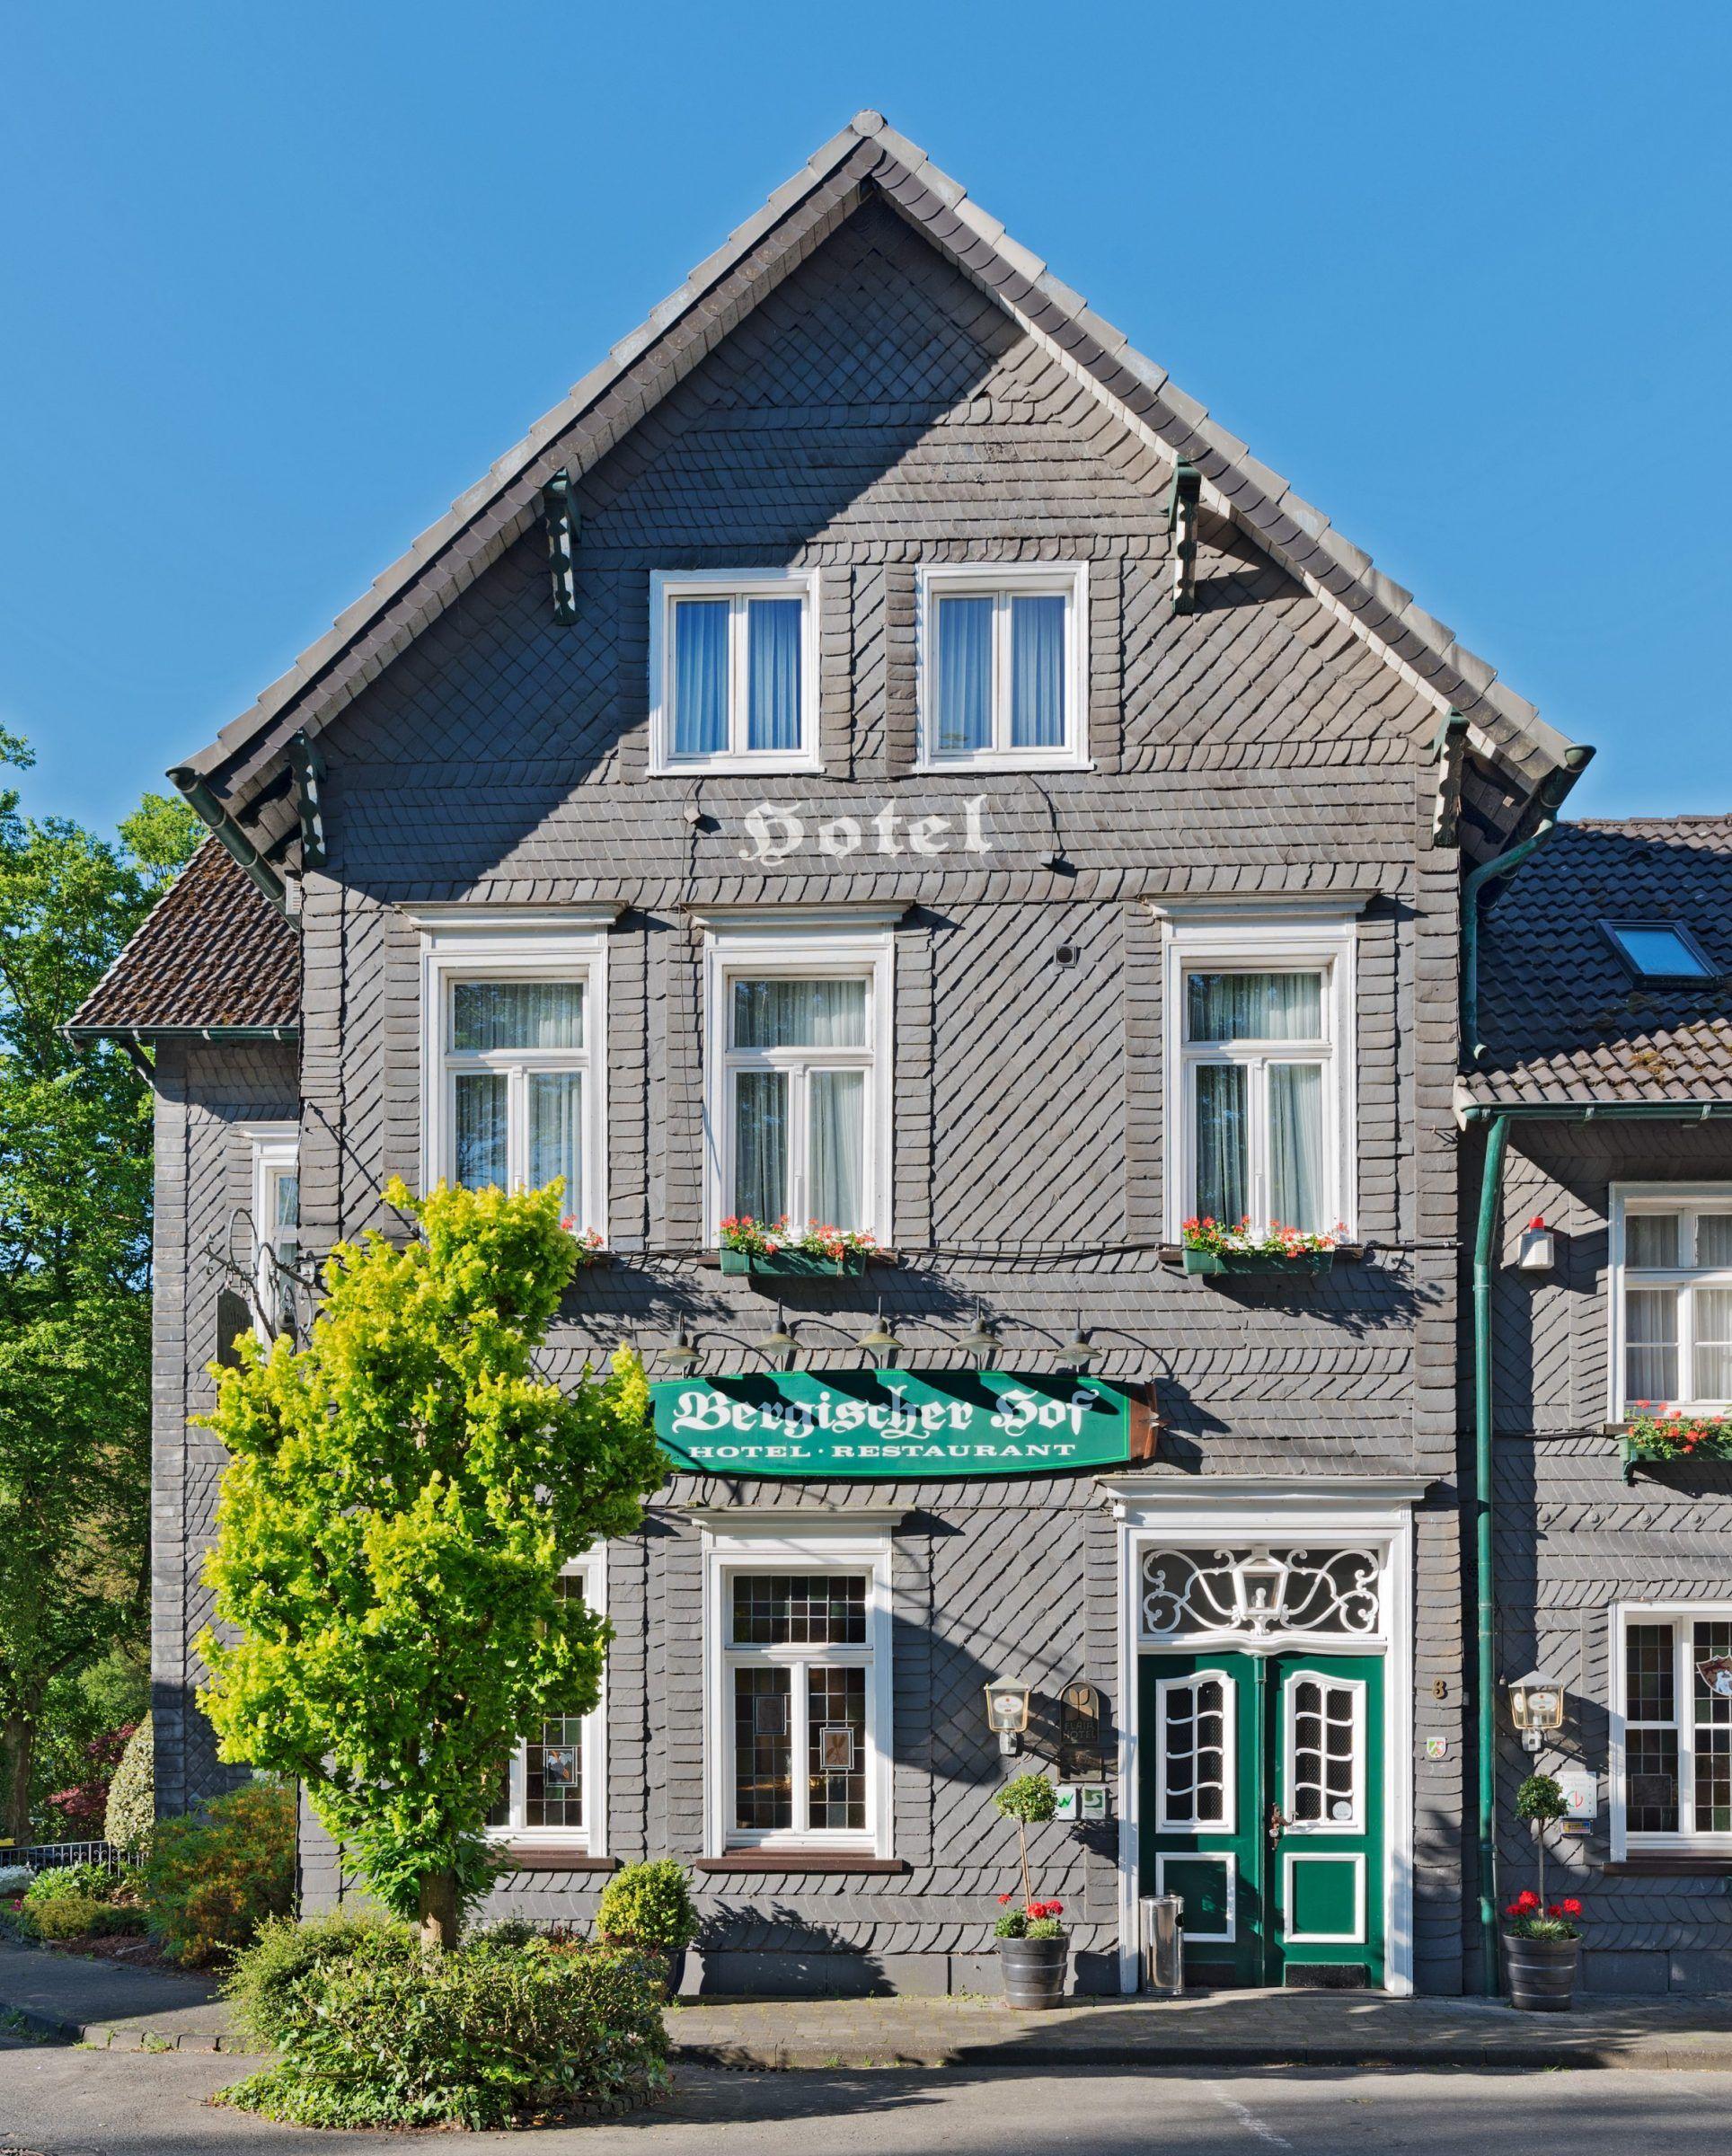 Flair Hotel Bergischer Hof außen